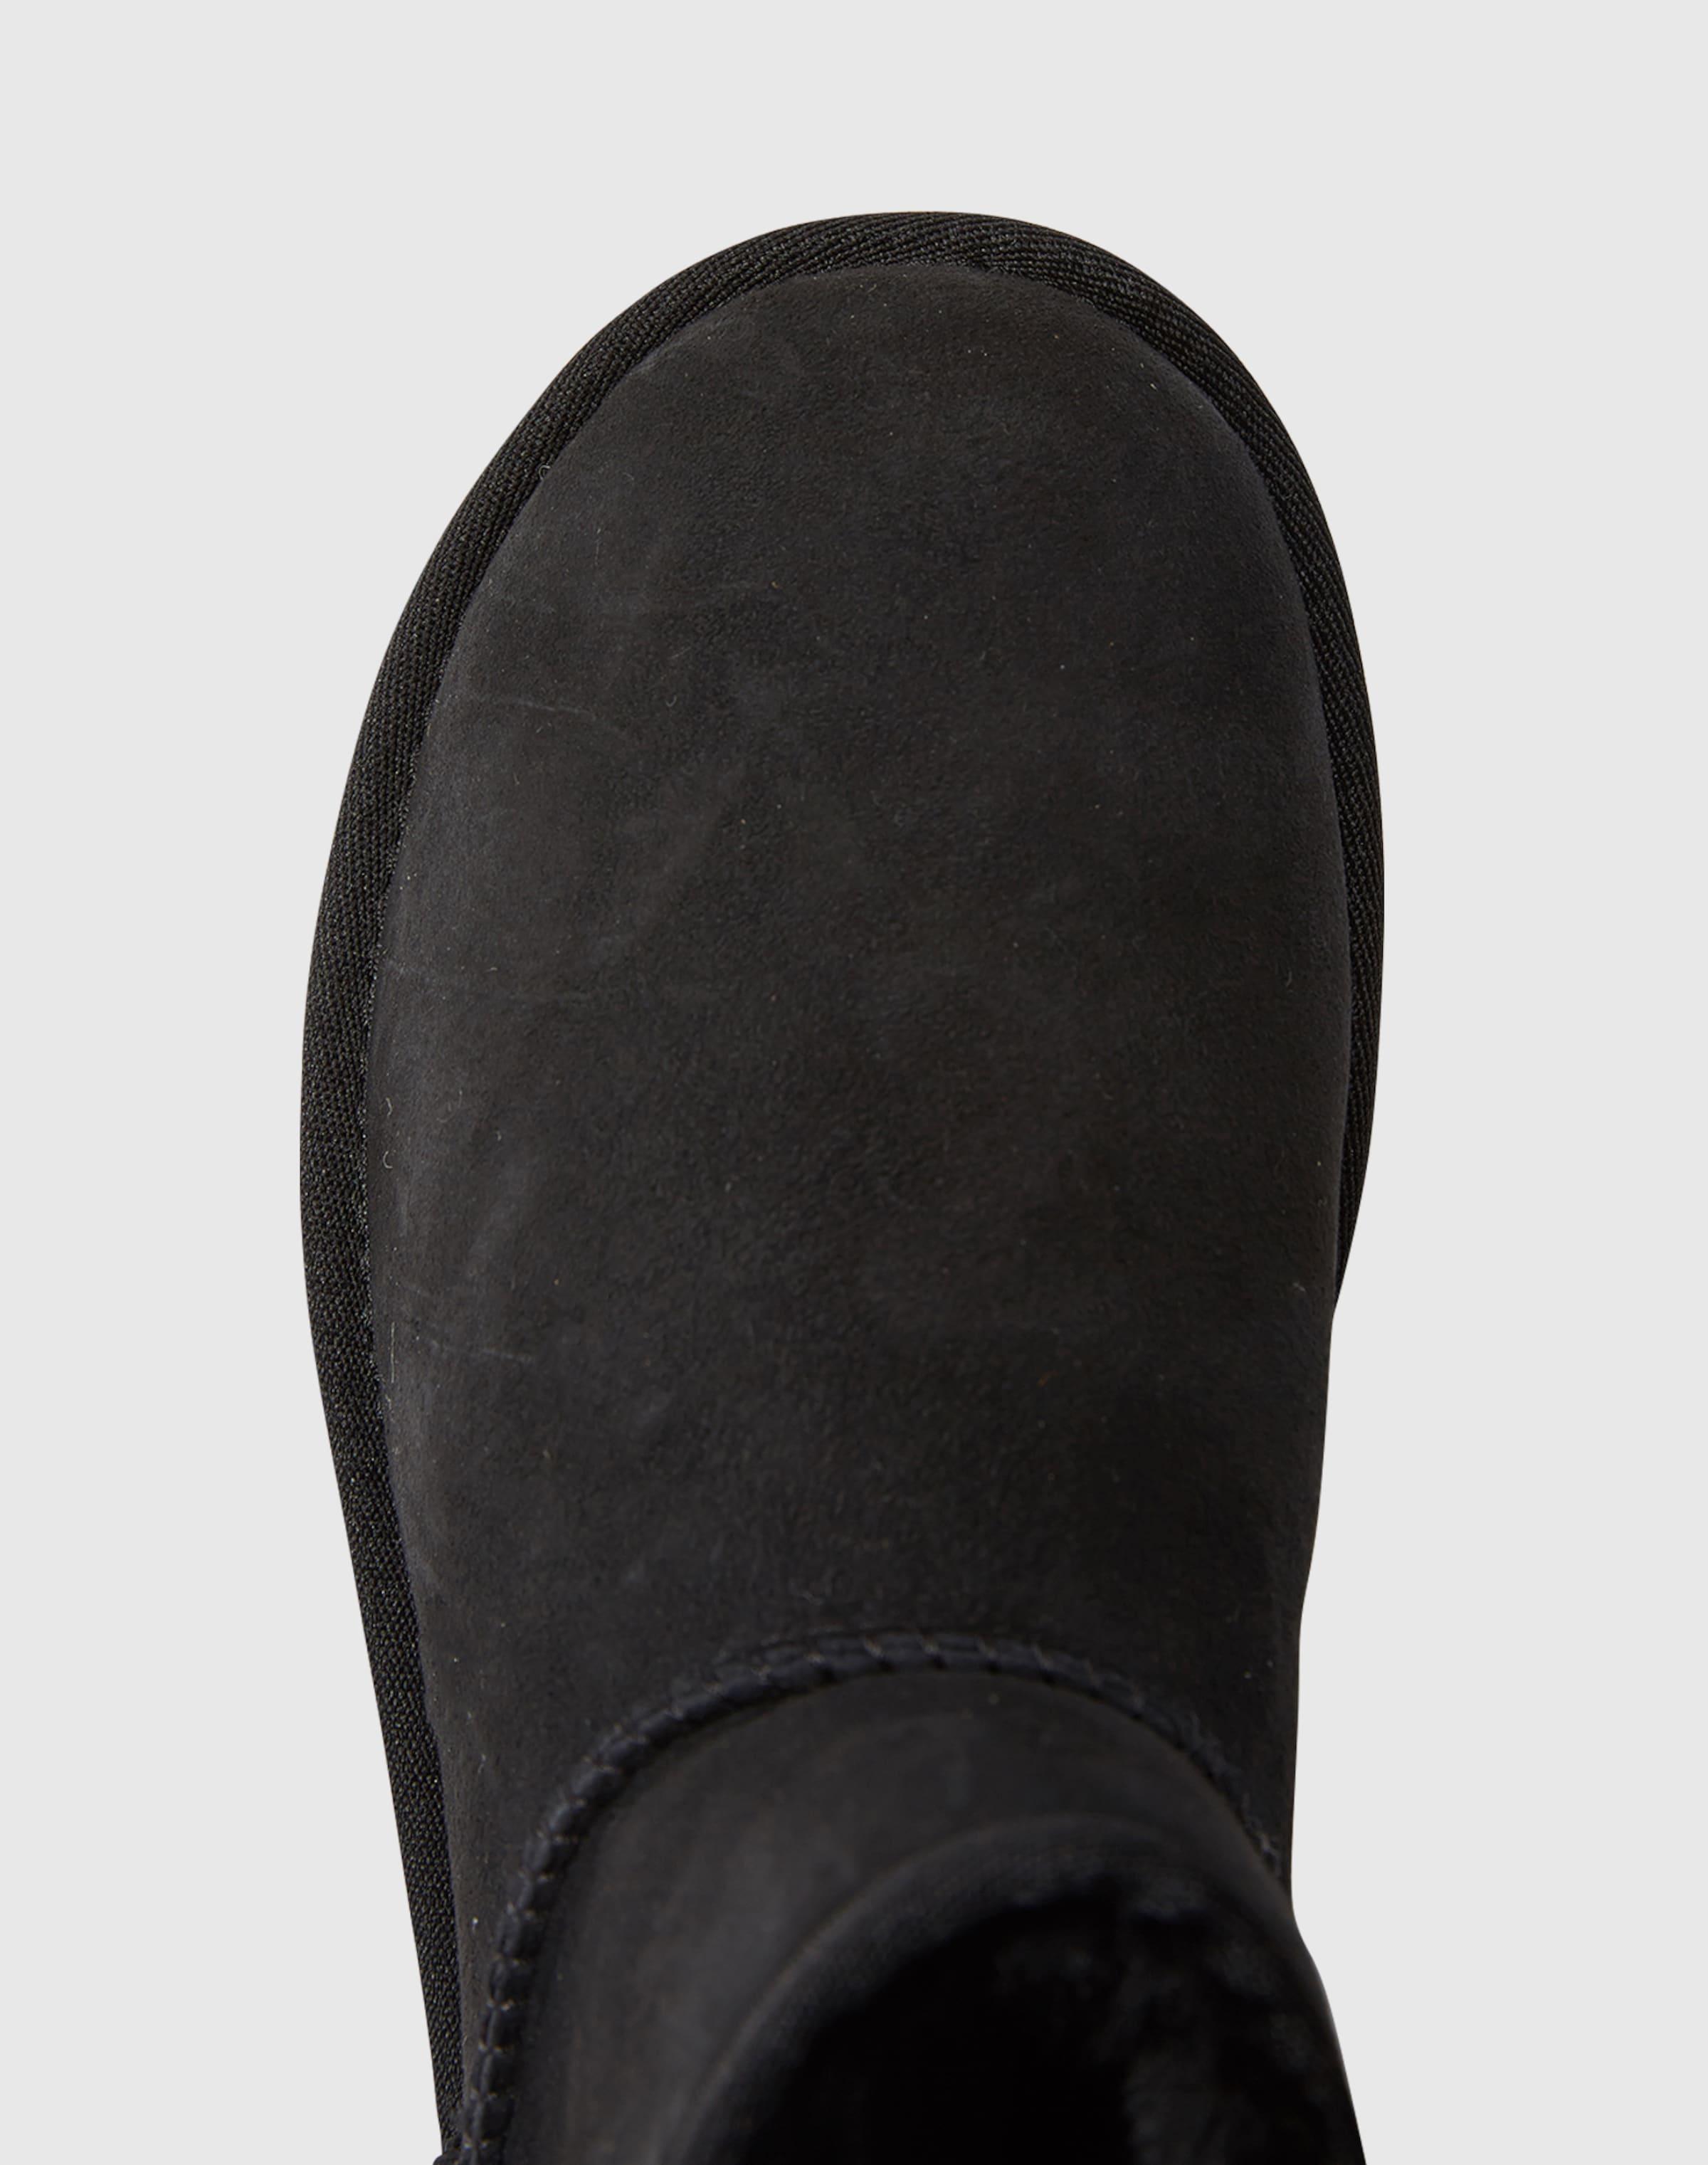 UGG Boots 'Classic Mini II' Günstiger Preis Niedrig Versandgebühr Online 100% Garantiert nC9wU